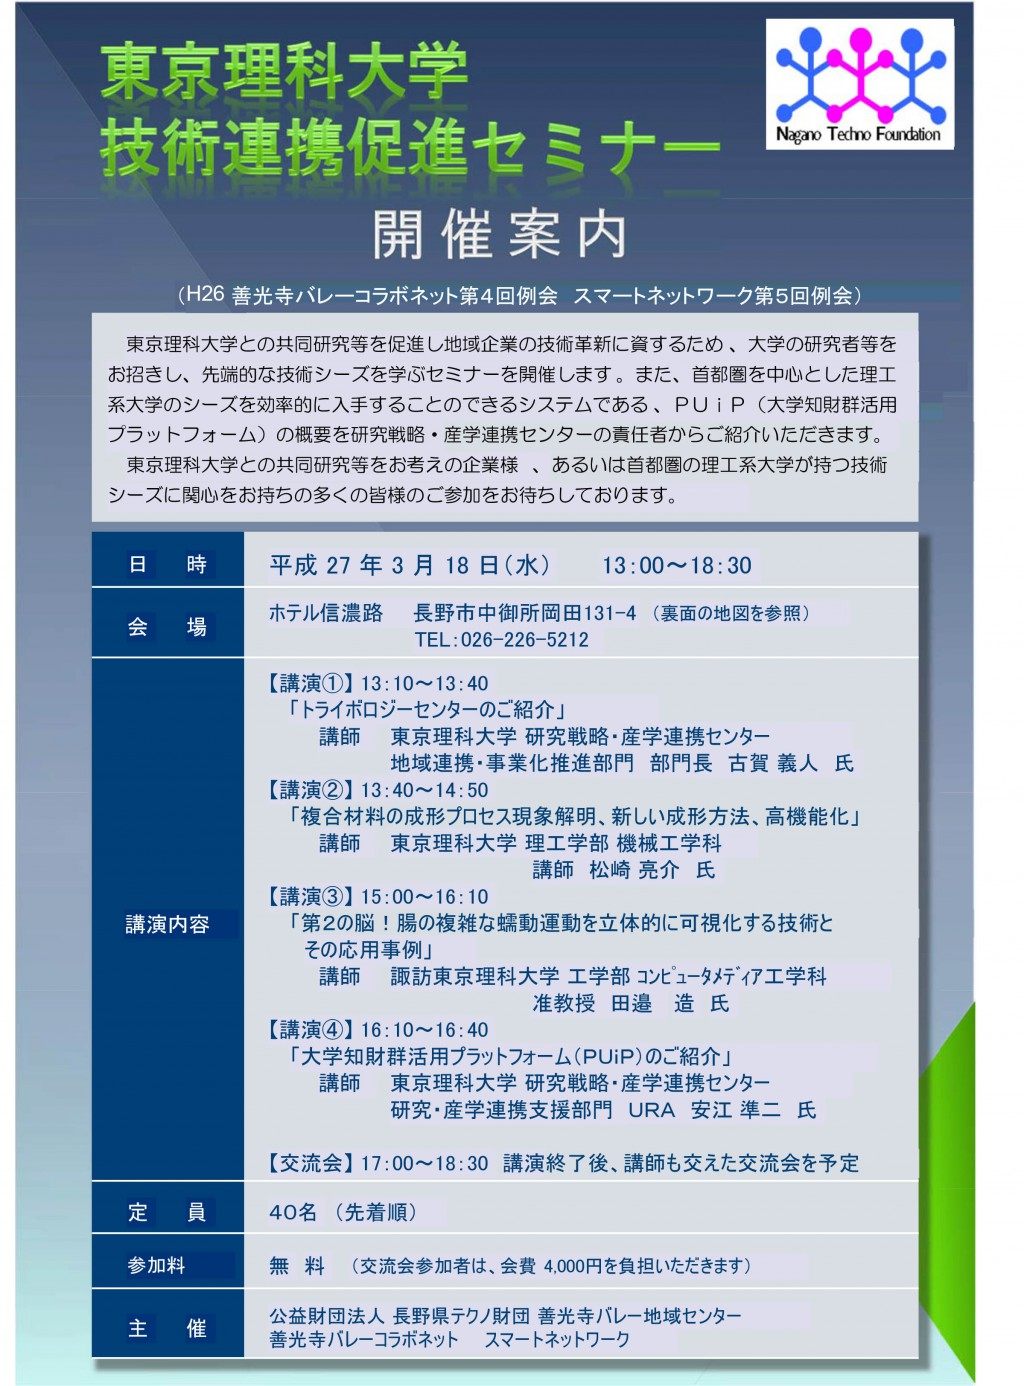 Microsoft Word - 技術連携促進セミナー開催案内(2)20